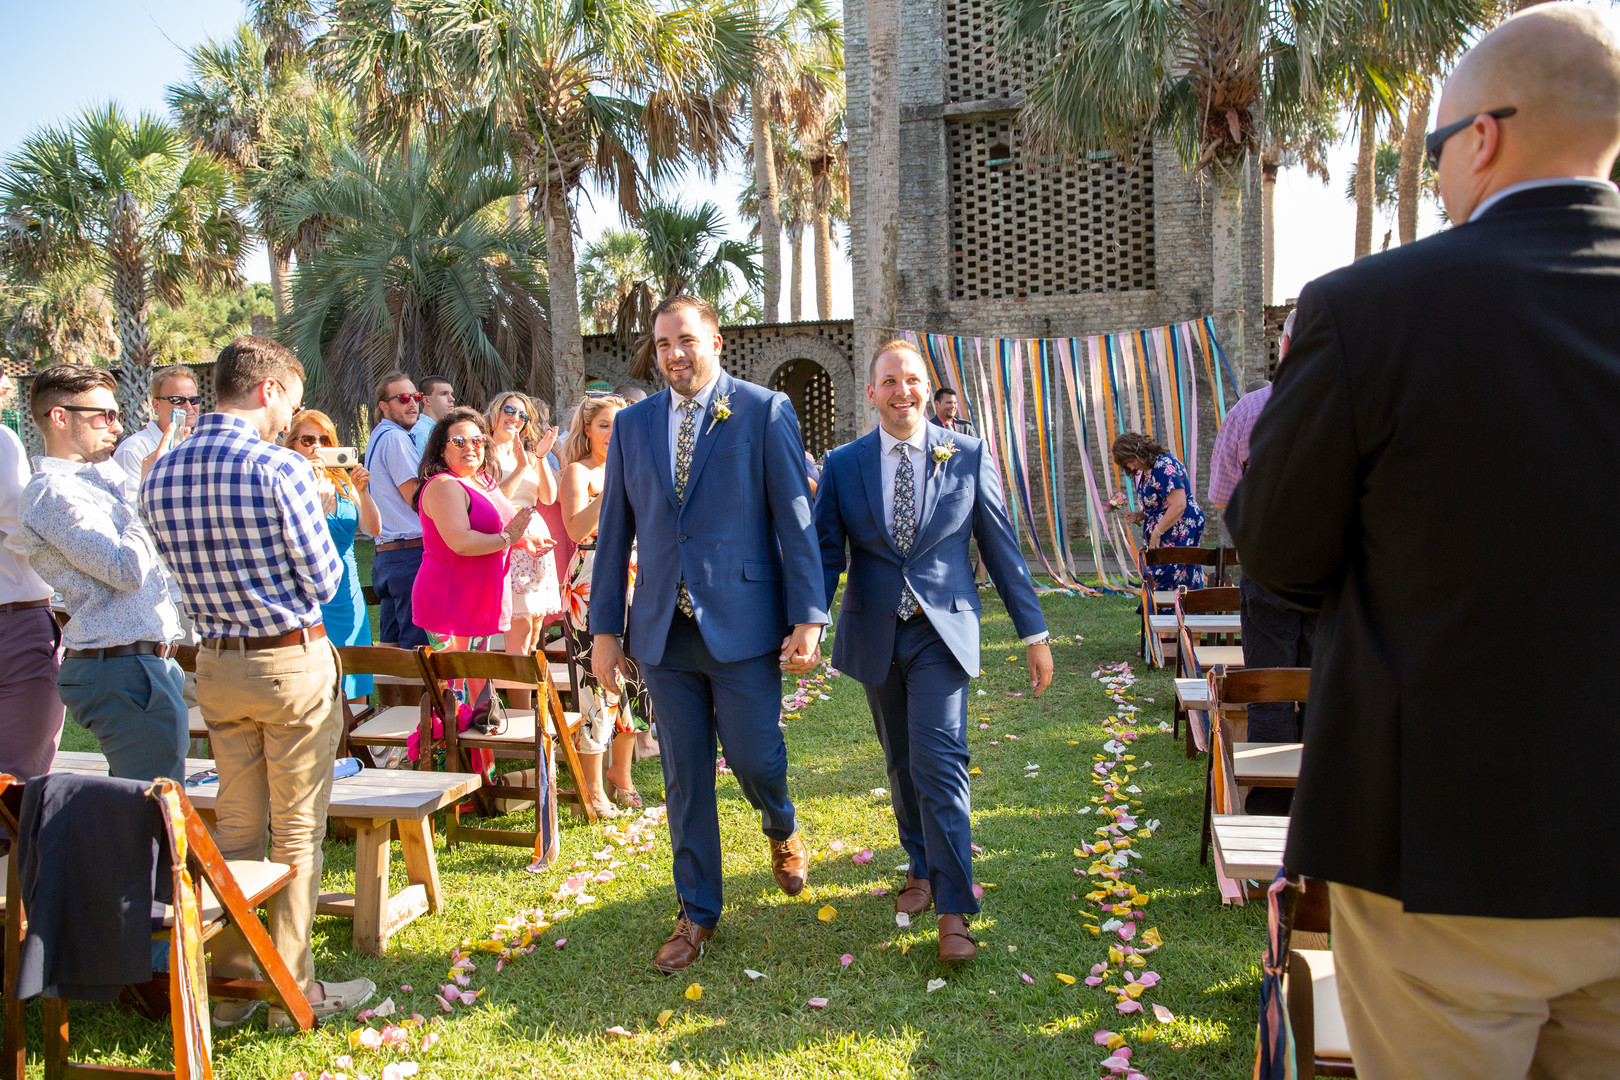 atalaya-castle-wedding-19.jpg